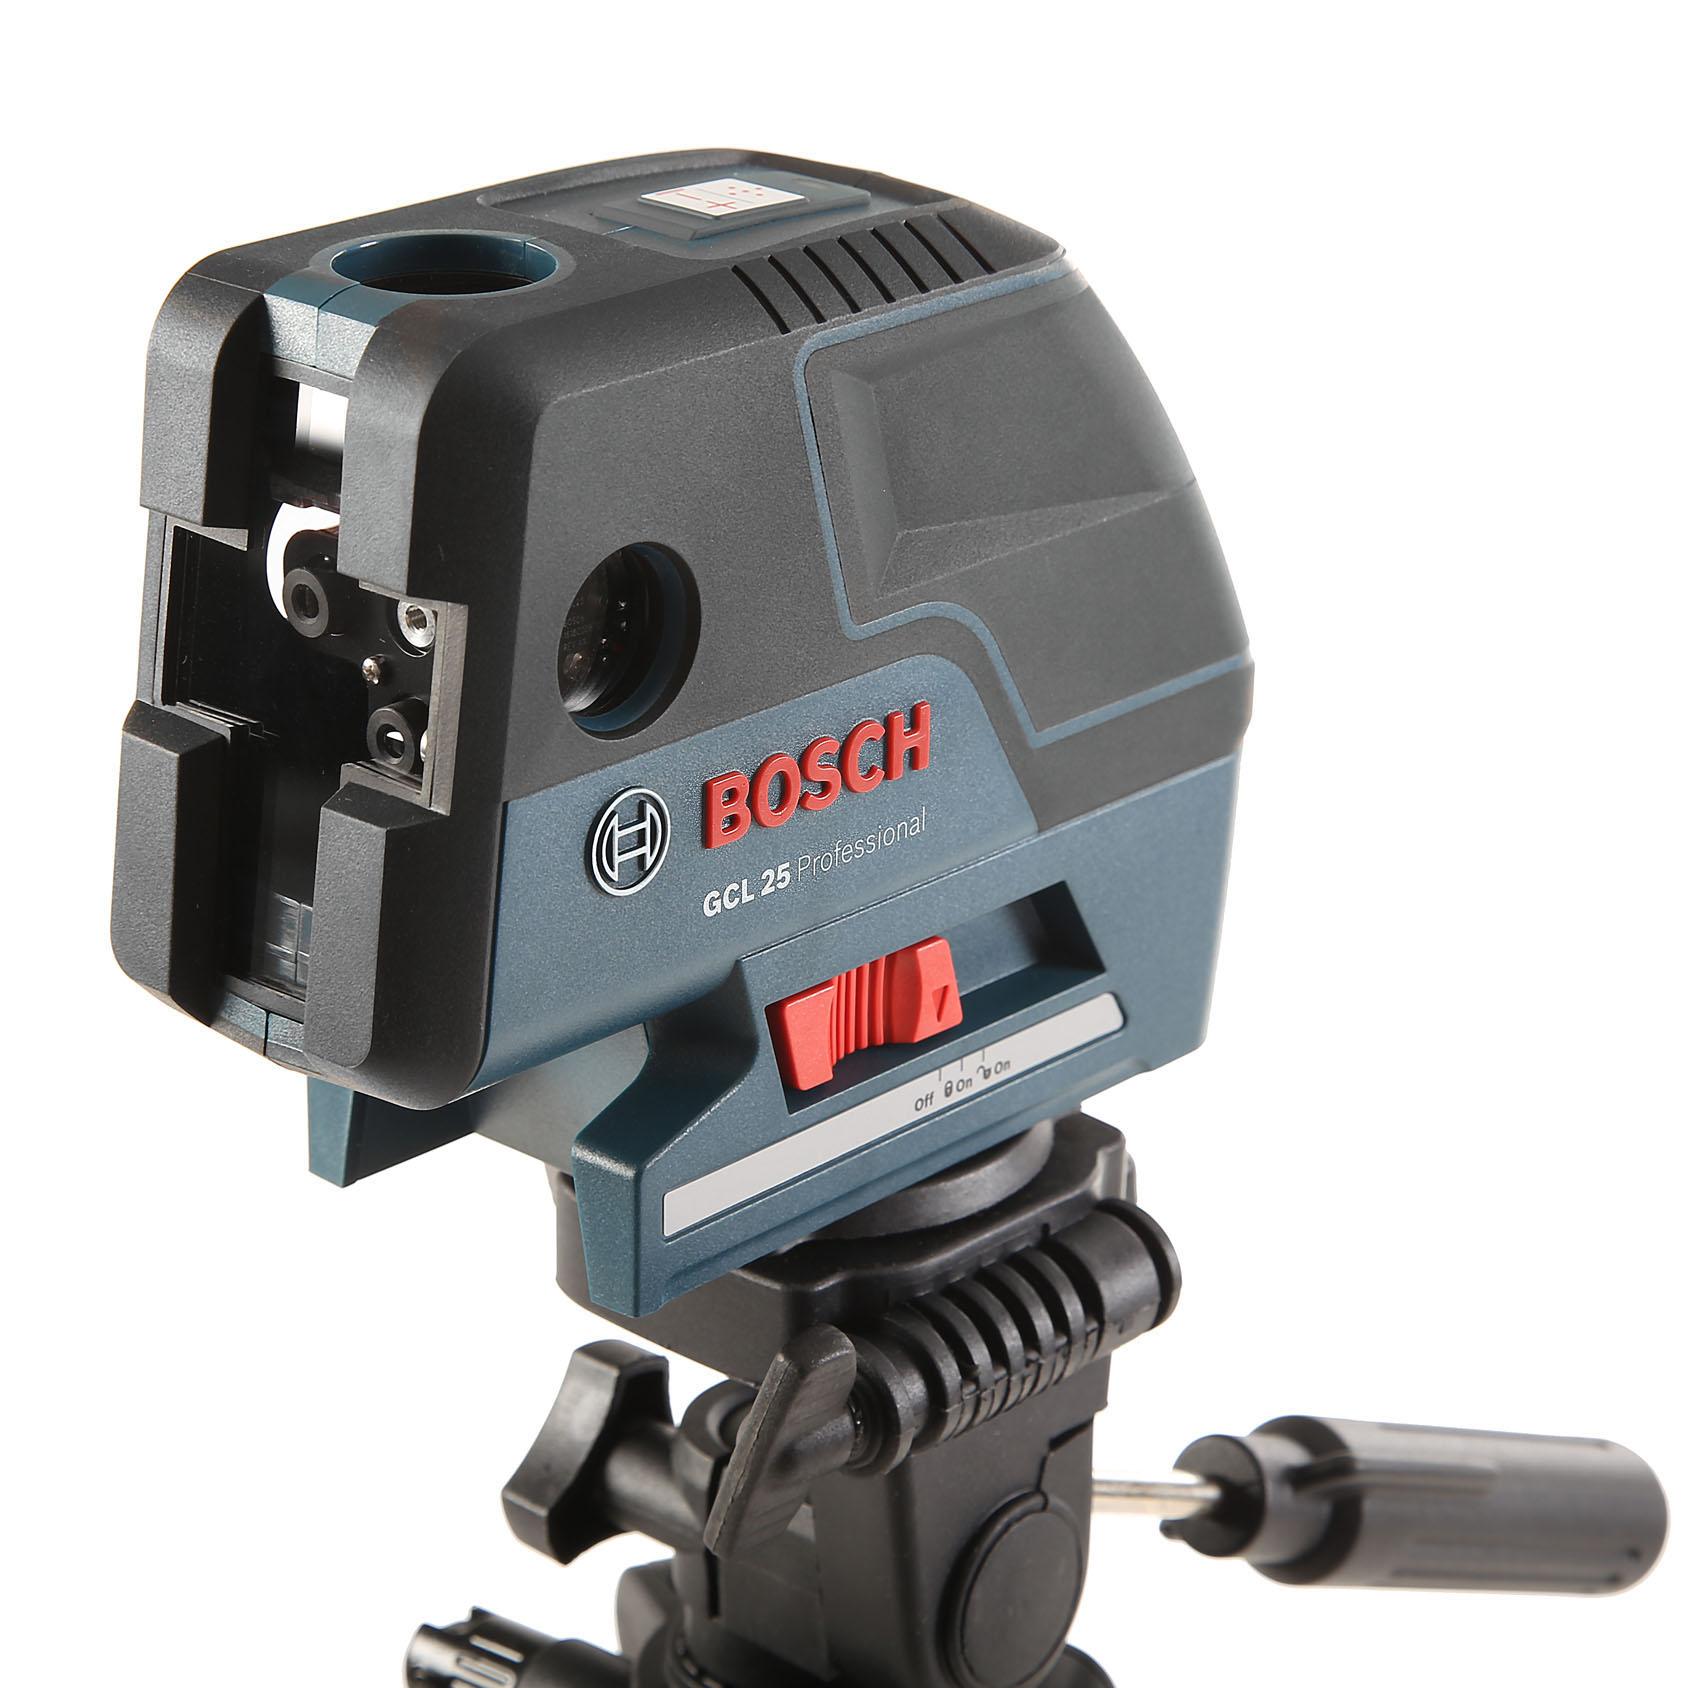 Уровень Bosch Gcl 25 professional + ШТАТИВ bs 150 (0.601.066.b01) bosch gkf 600 professional 060160a101